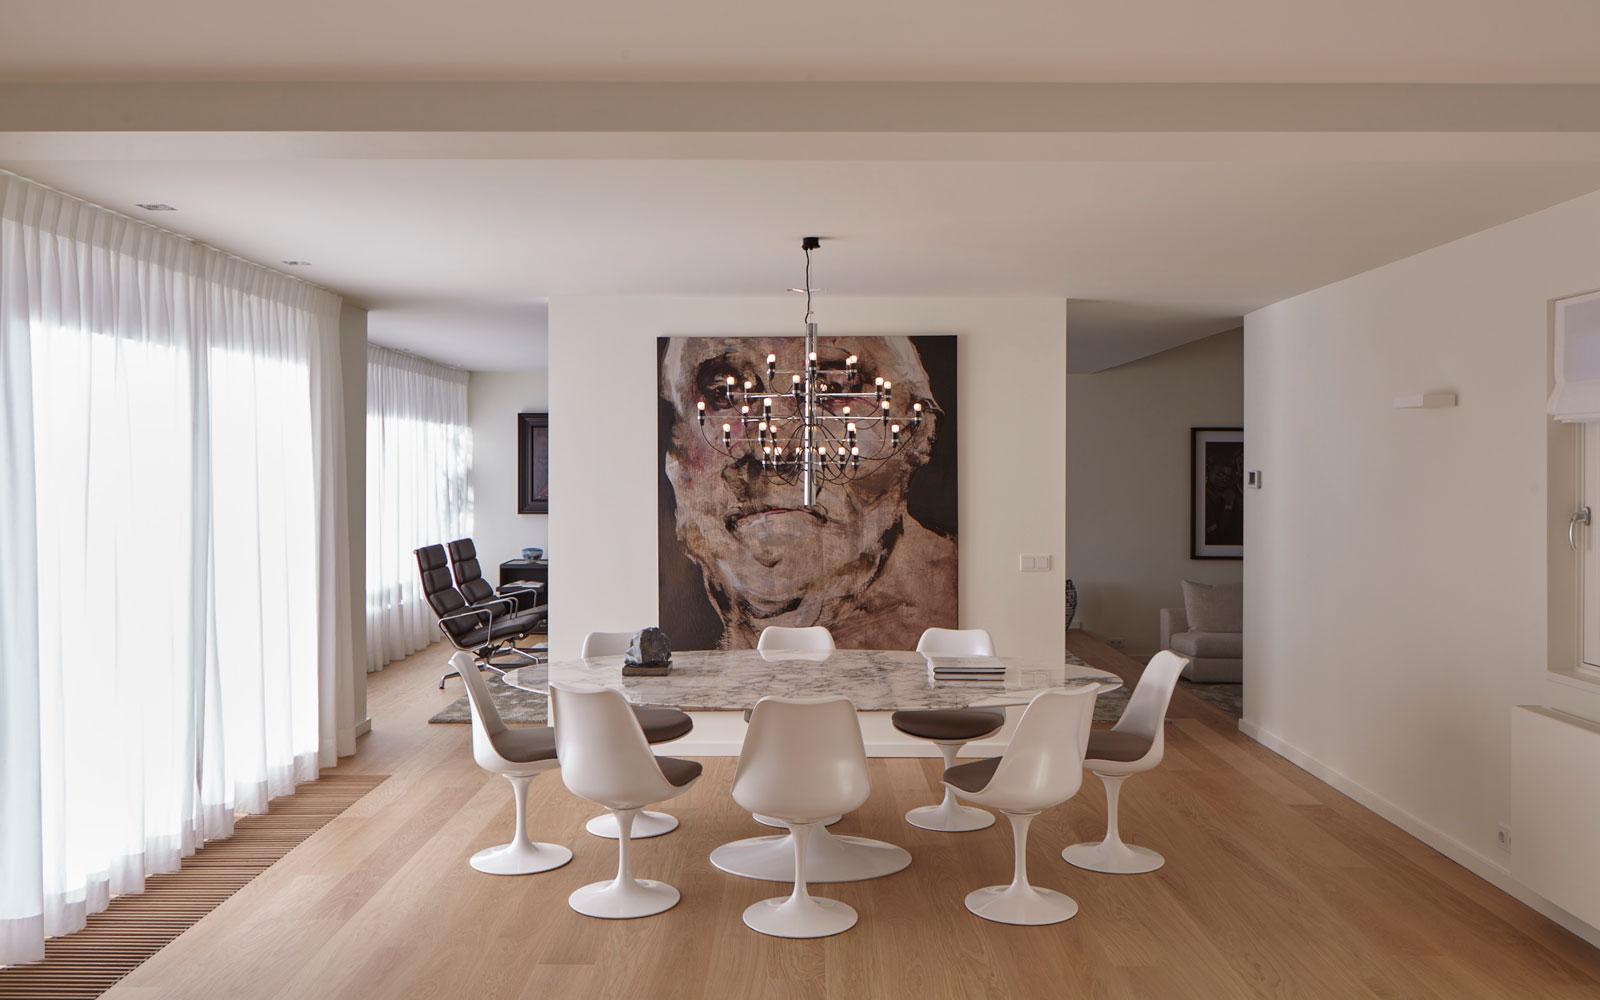 Grote, witte, ovale eettafel, marmeren blad, Knoll, lamp van Flos, landelijke villa, Francine Broos